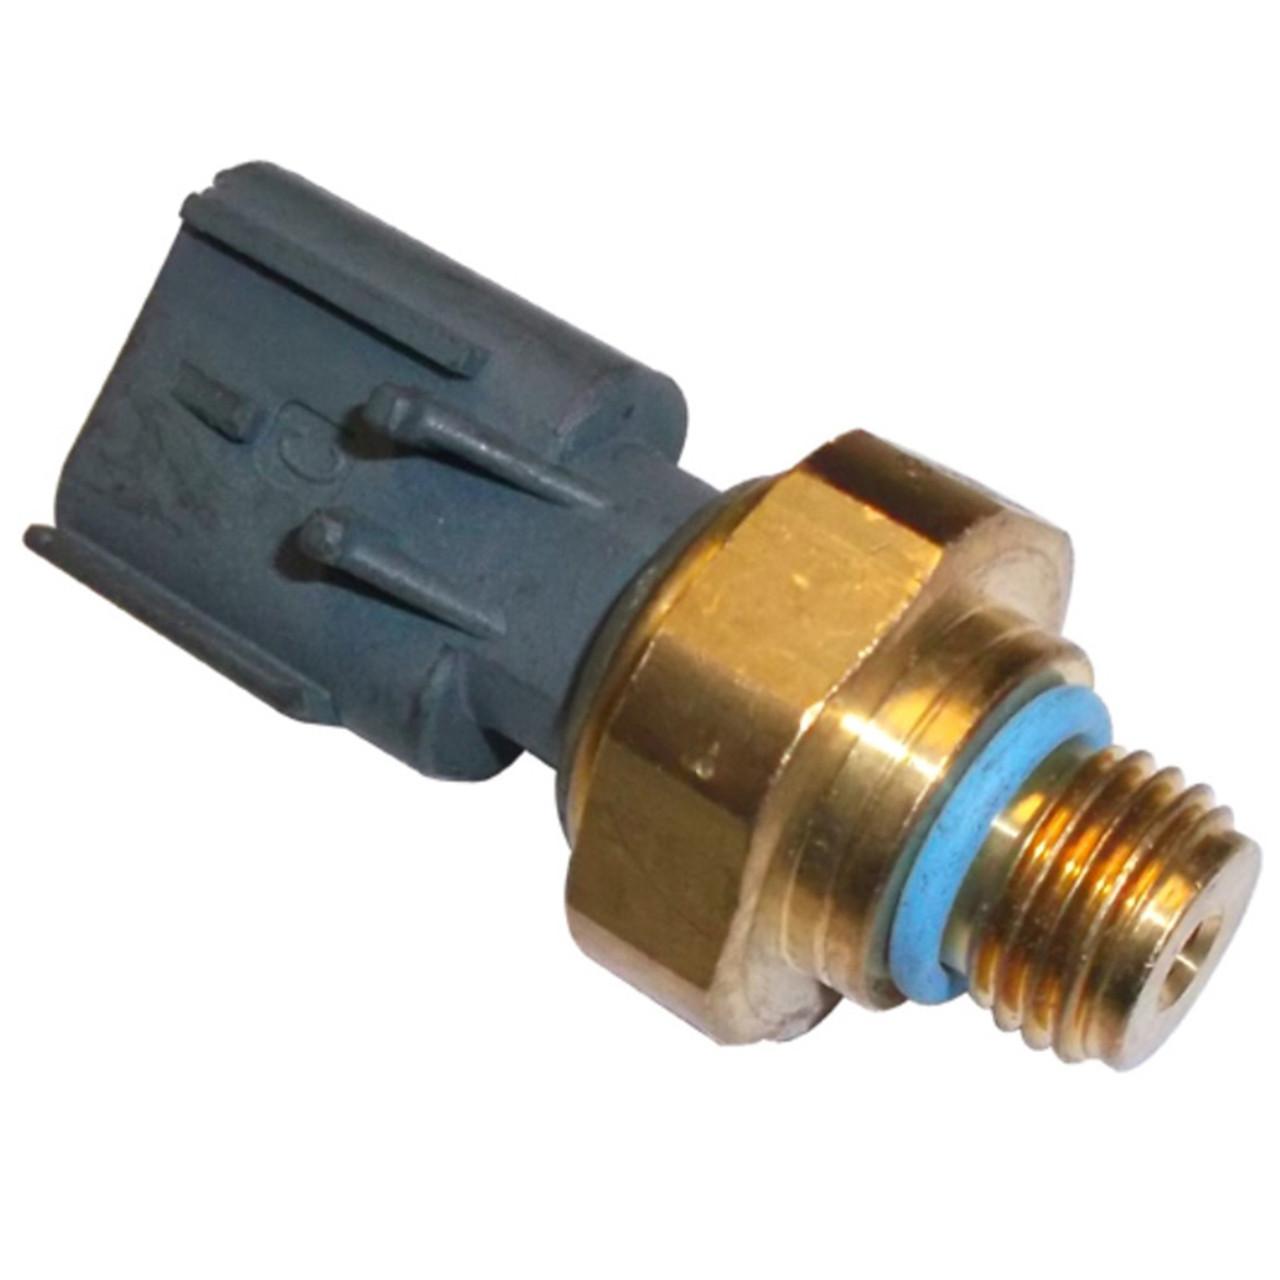 dodge 6 7l 2007 2019 exhaust back pressure sensor bts031323